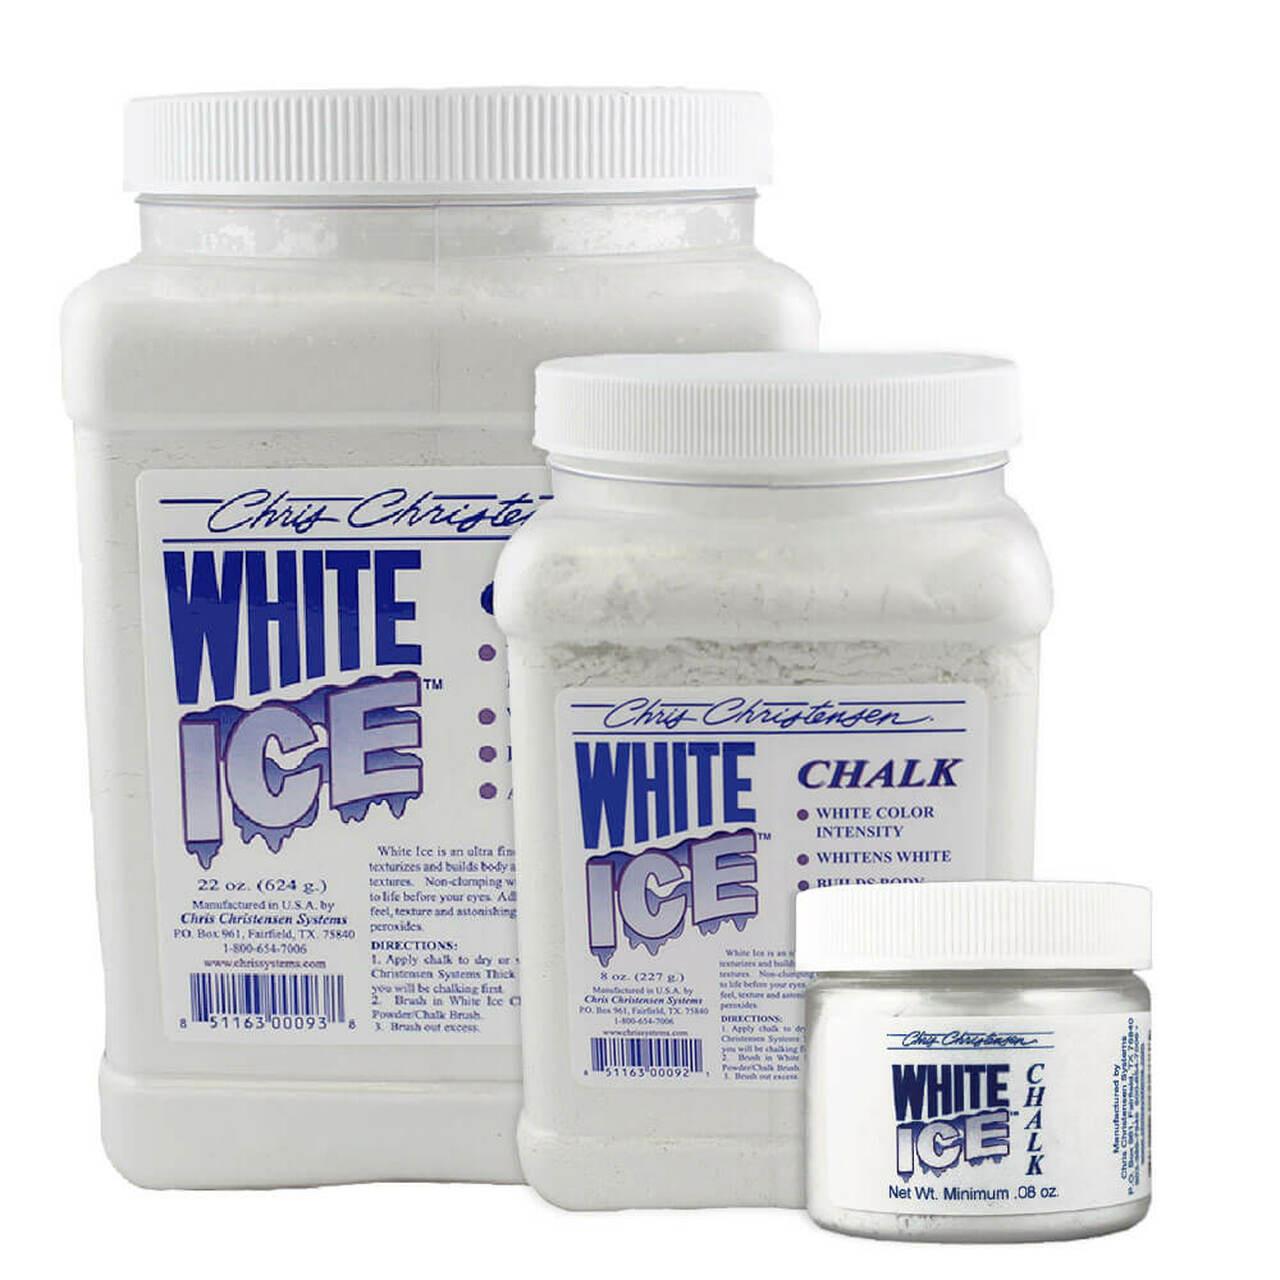 Chris Christensen White Ice Chalk talc